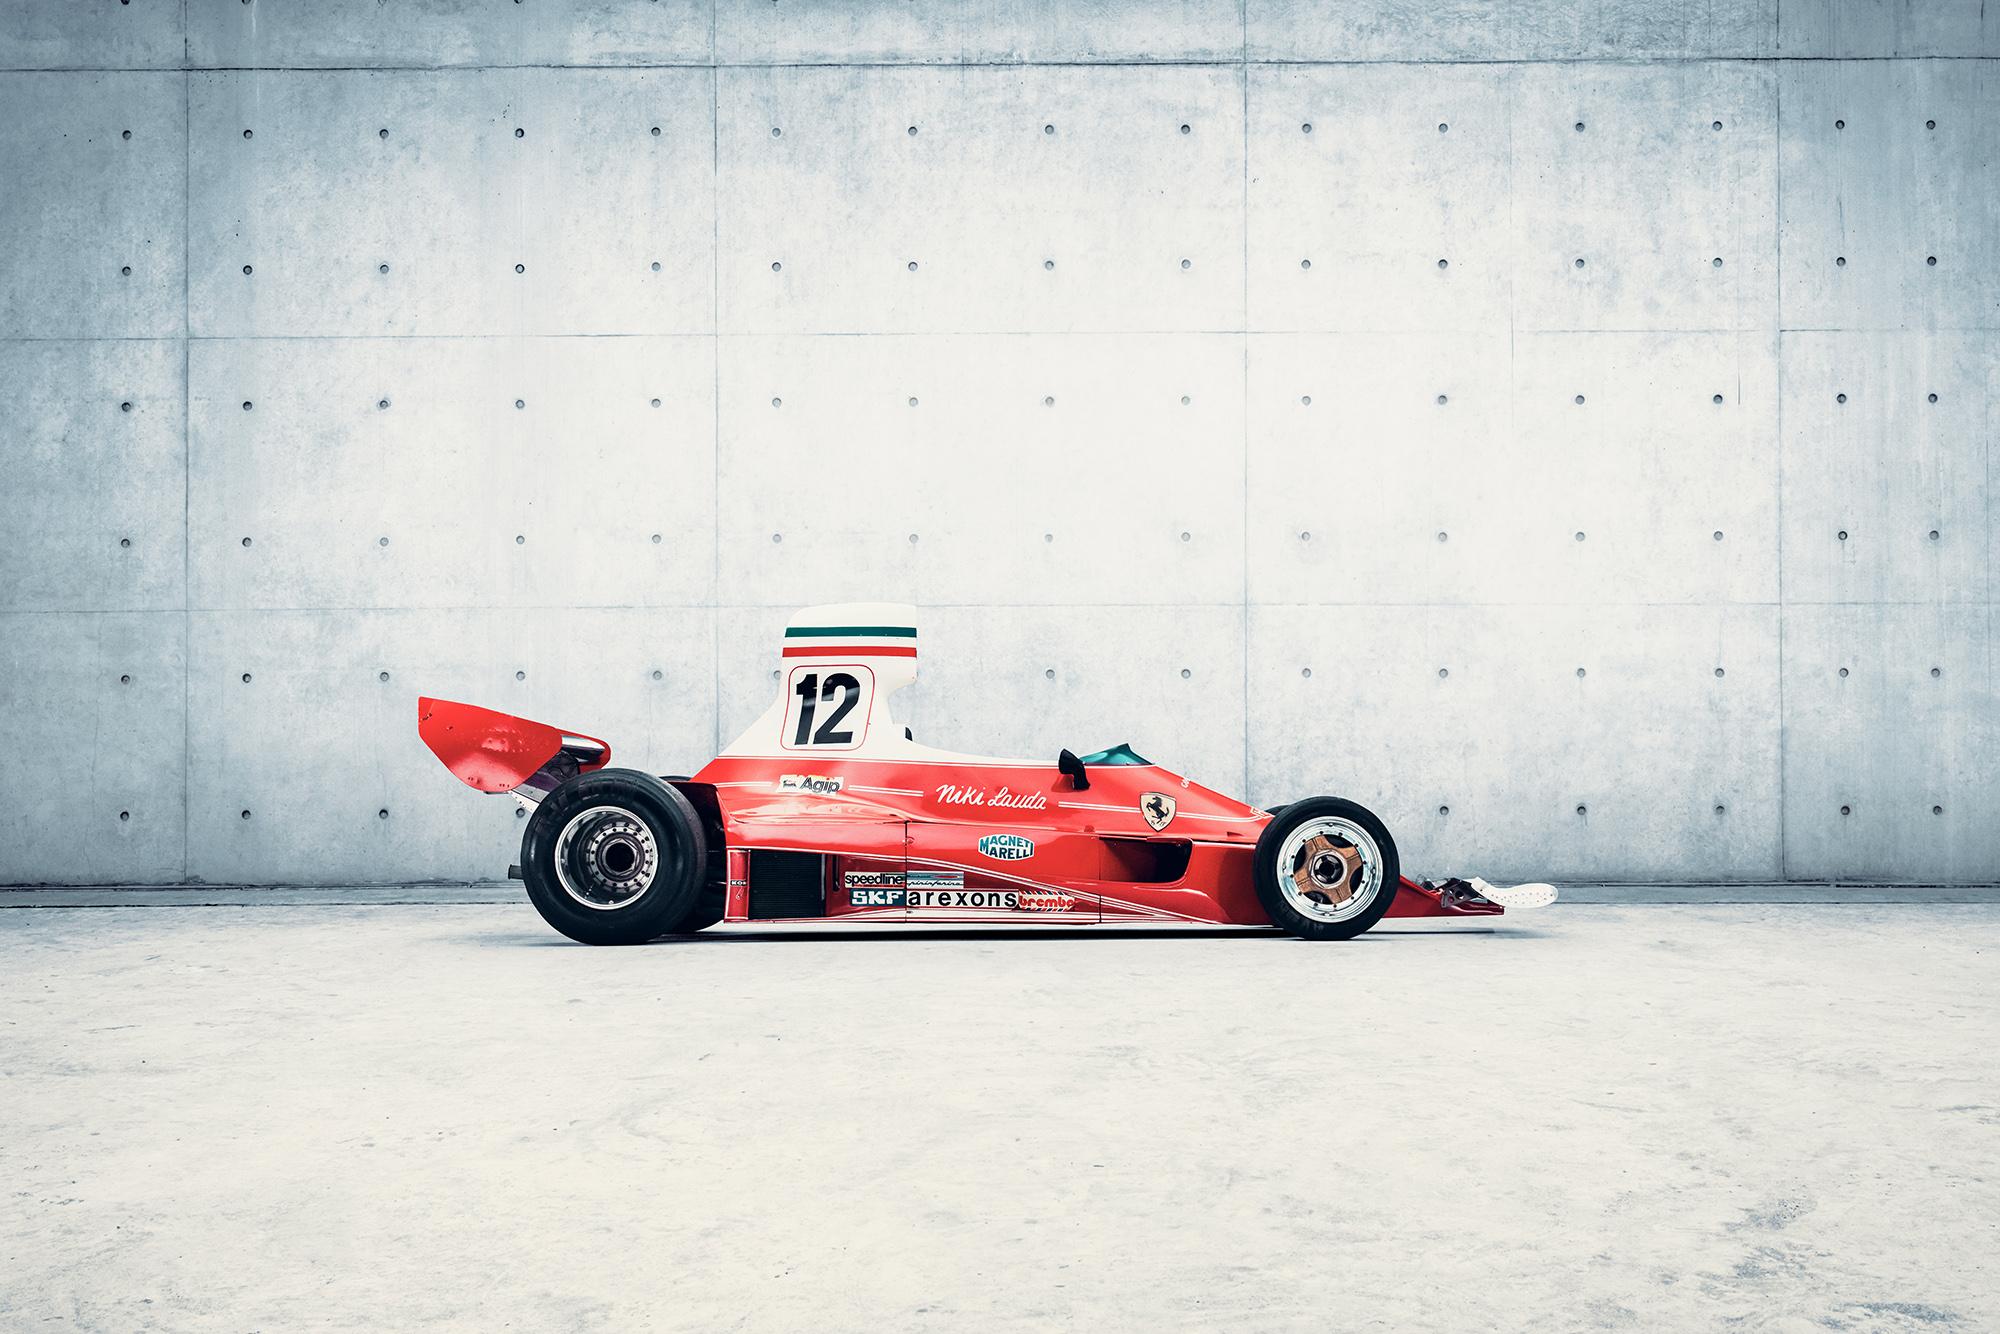 Side view of the Ferrari 312T in which Niki Lauda won five grands prix